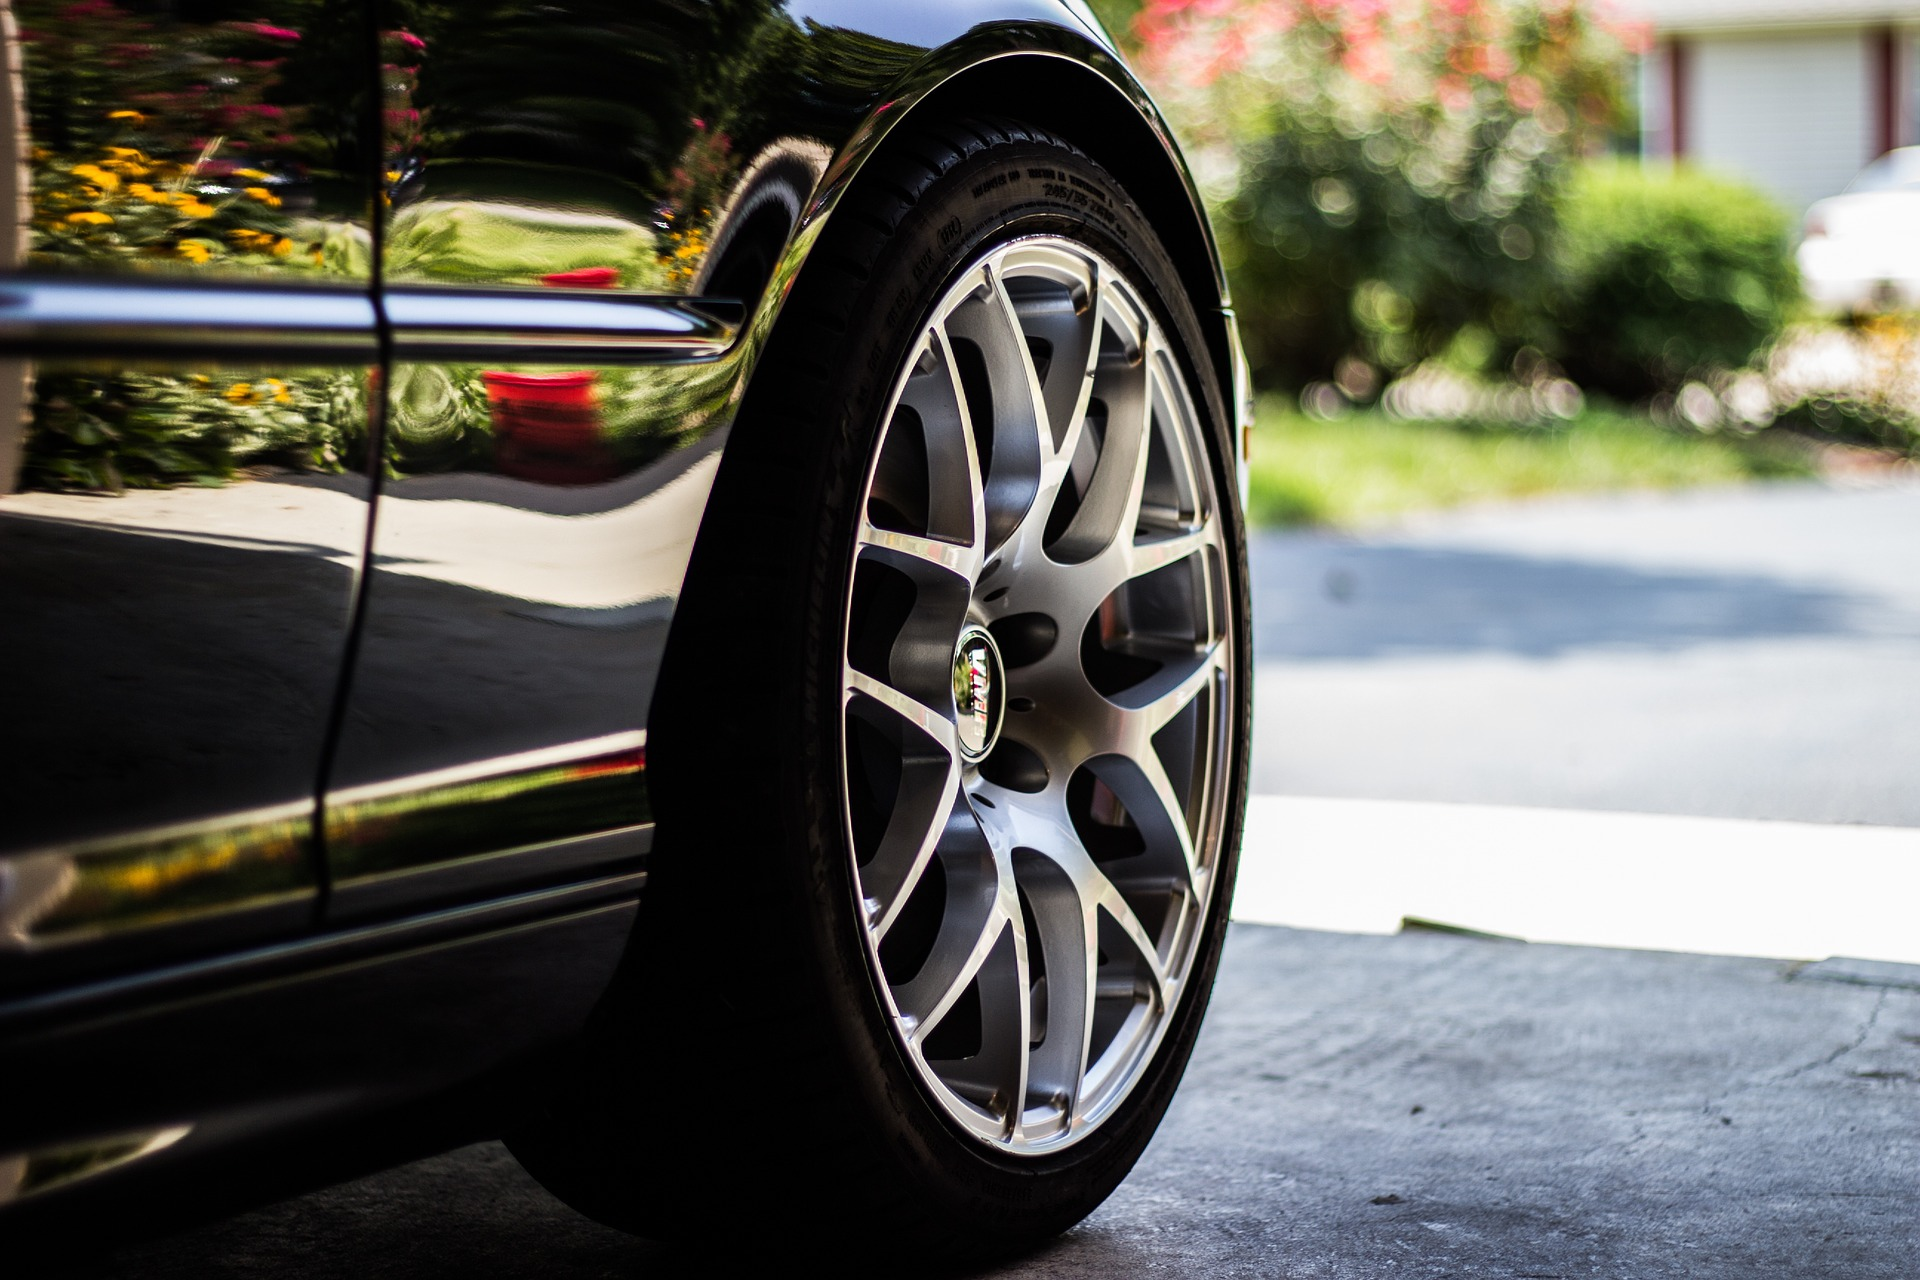 5 Komponen Kaki-kaki Mobil Yang Wajib Diketahui